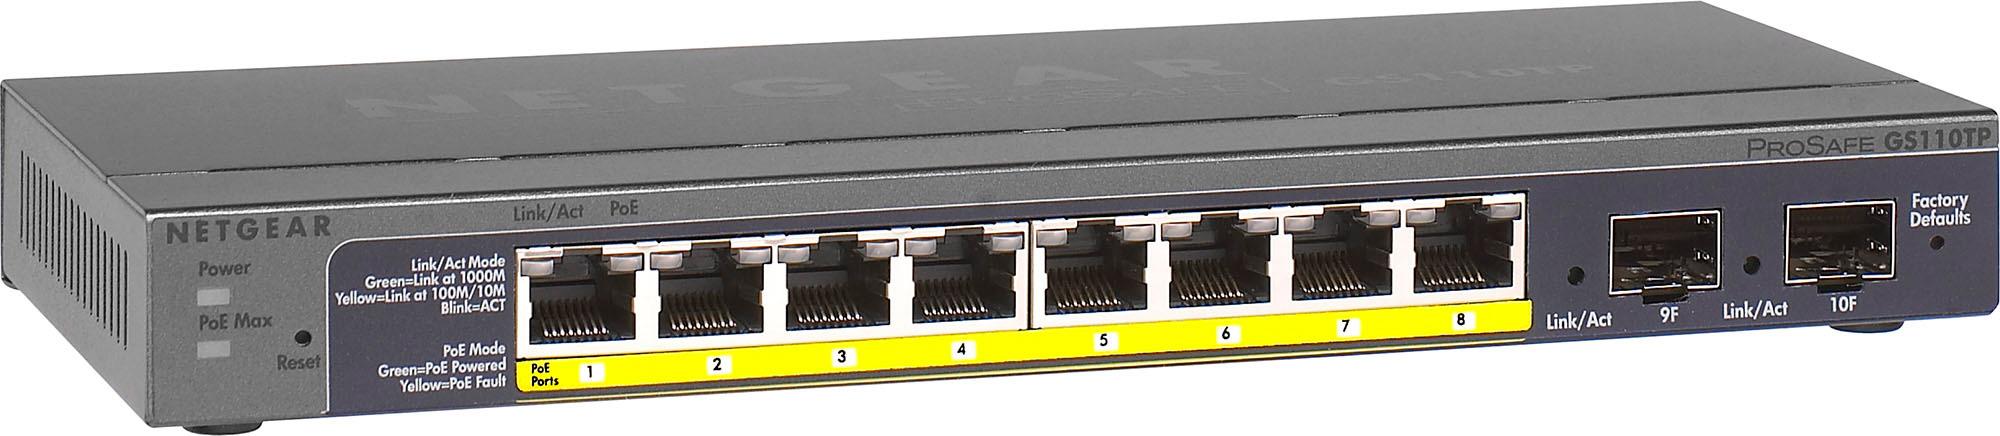 Netgear GS110TP-300NAS 8-Port Gigabit PoEplus Ethernet Smart Switch with 2 SFP Ports and Cloud Management - 55 Watt  GS110TP-300NAS